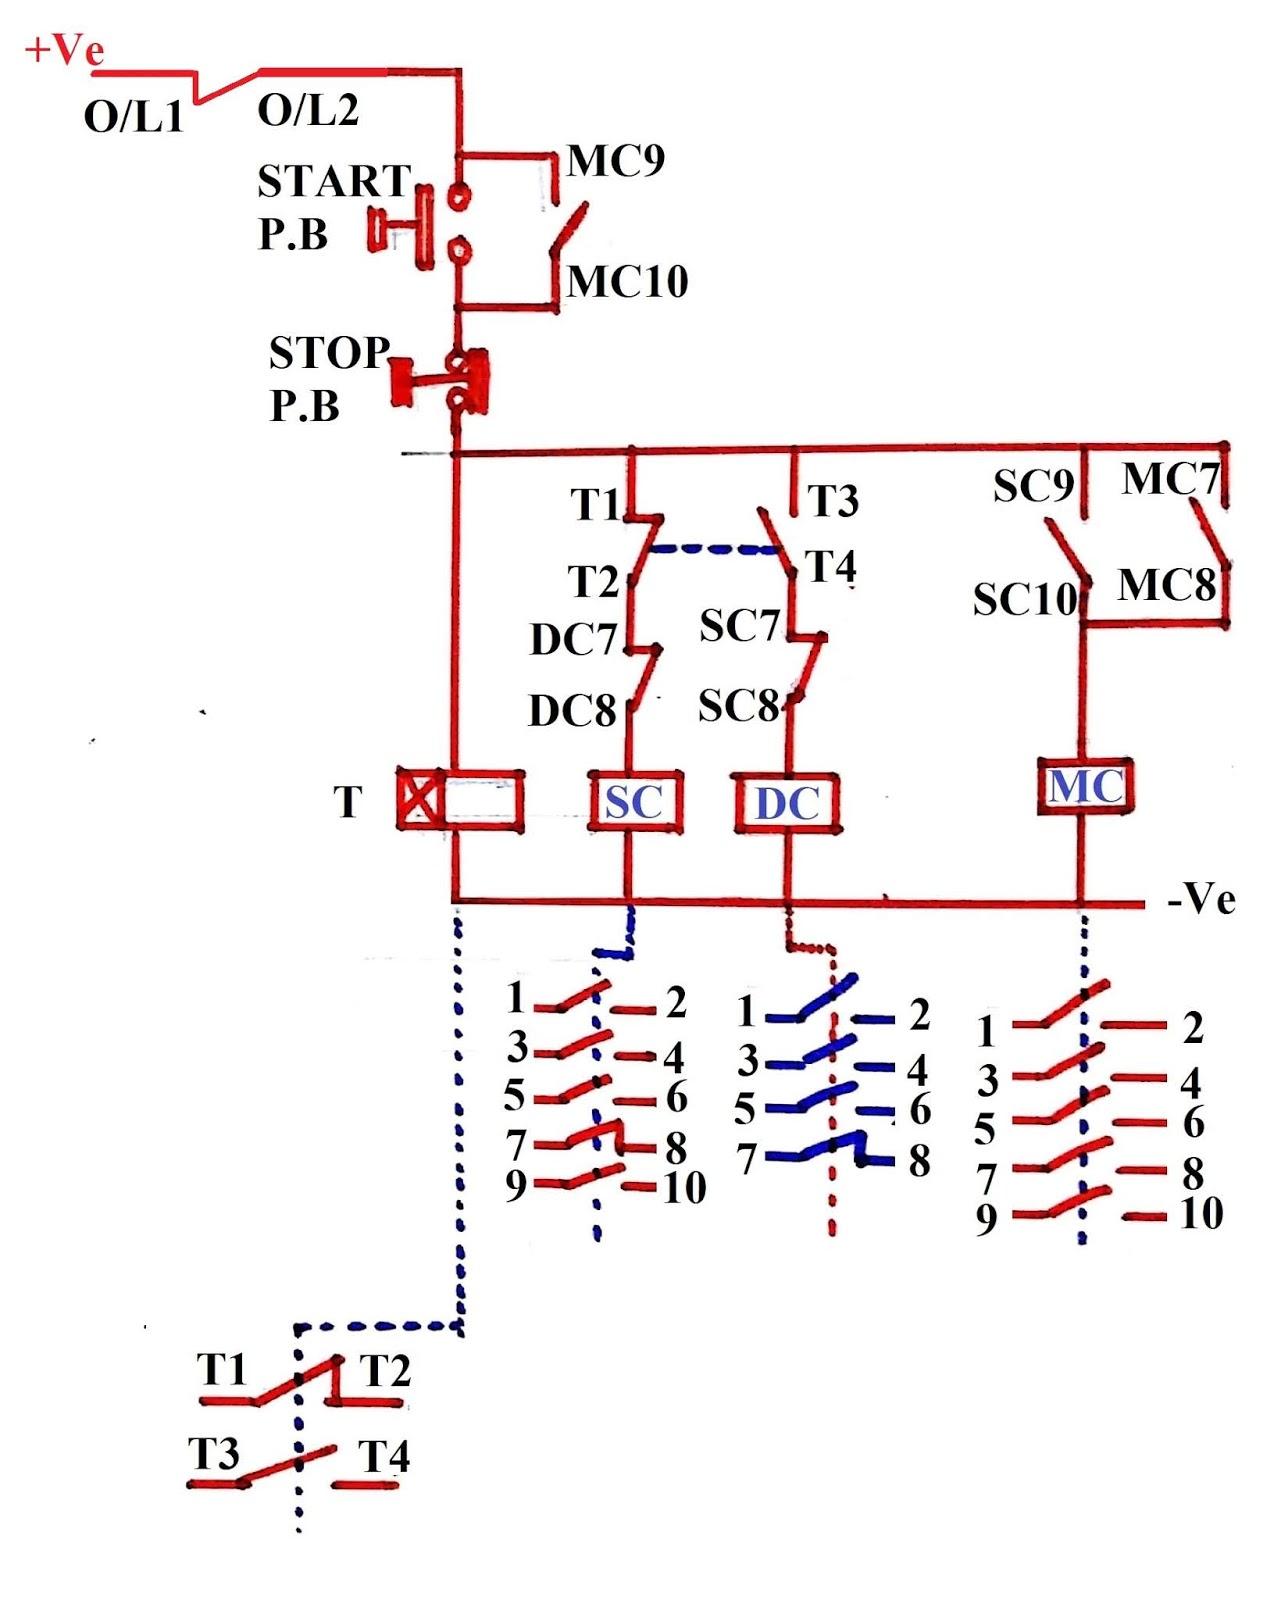 fig 2 star delta starter control wiring diagram https electricaltechnologyrishi blogspot com [ 1274 x 1600 Pixel ]